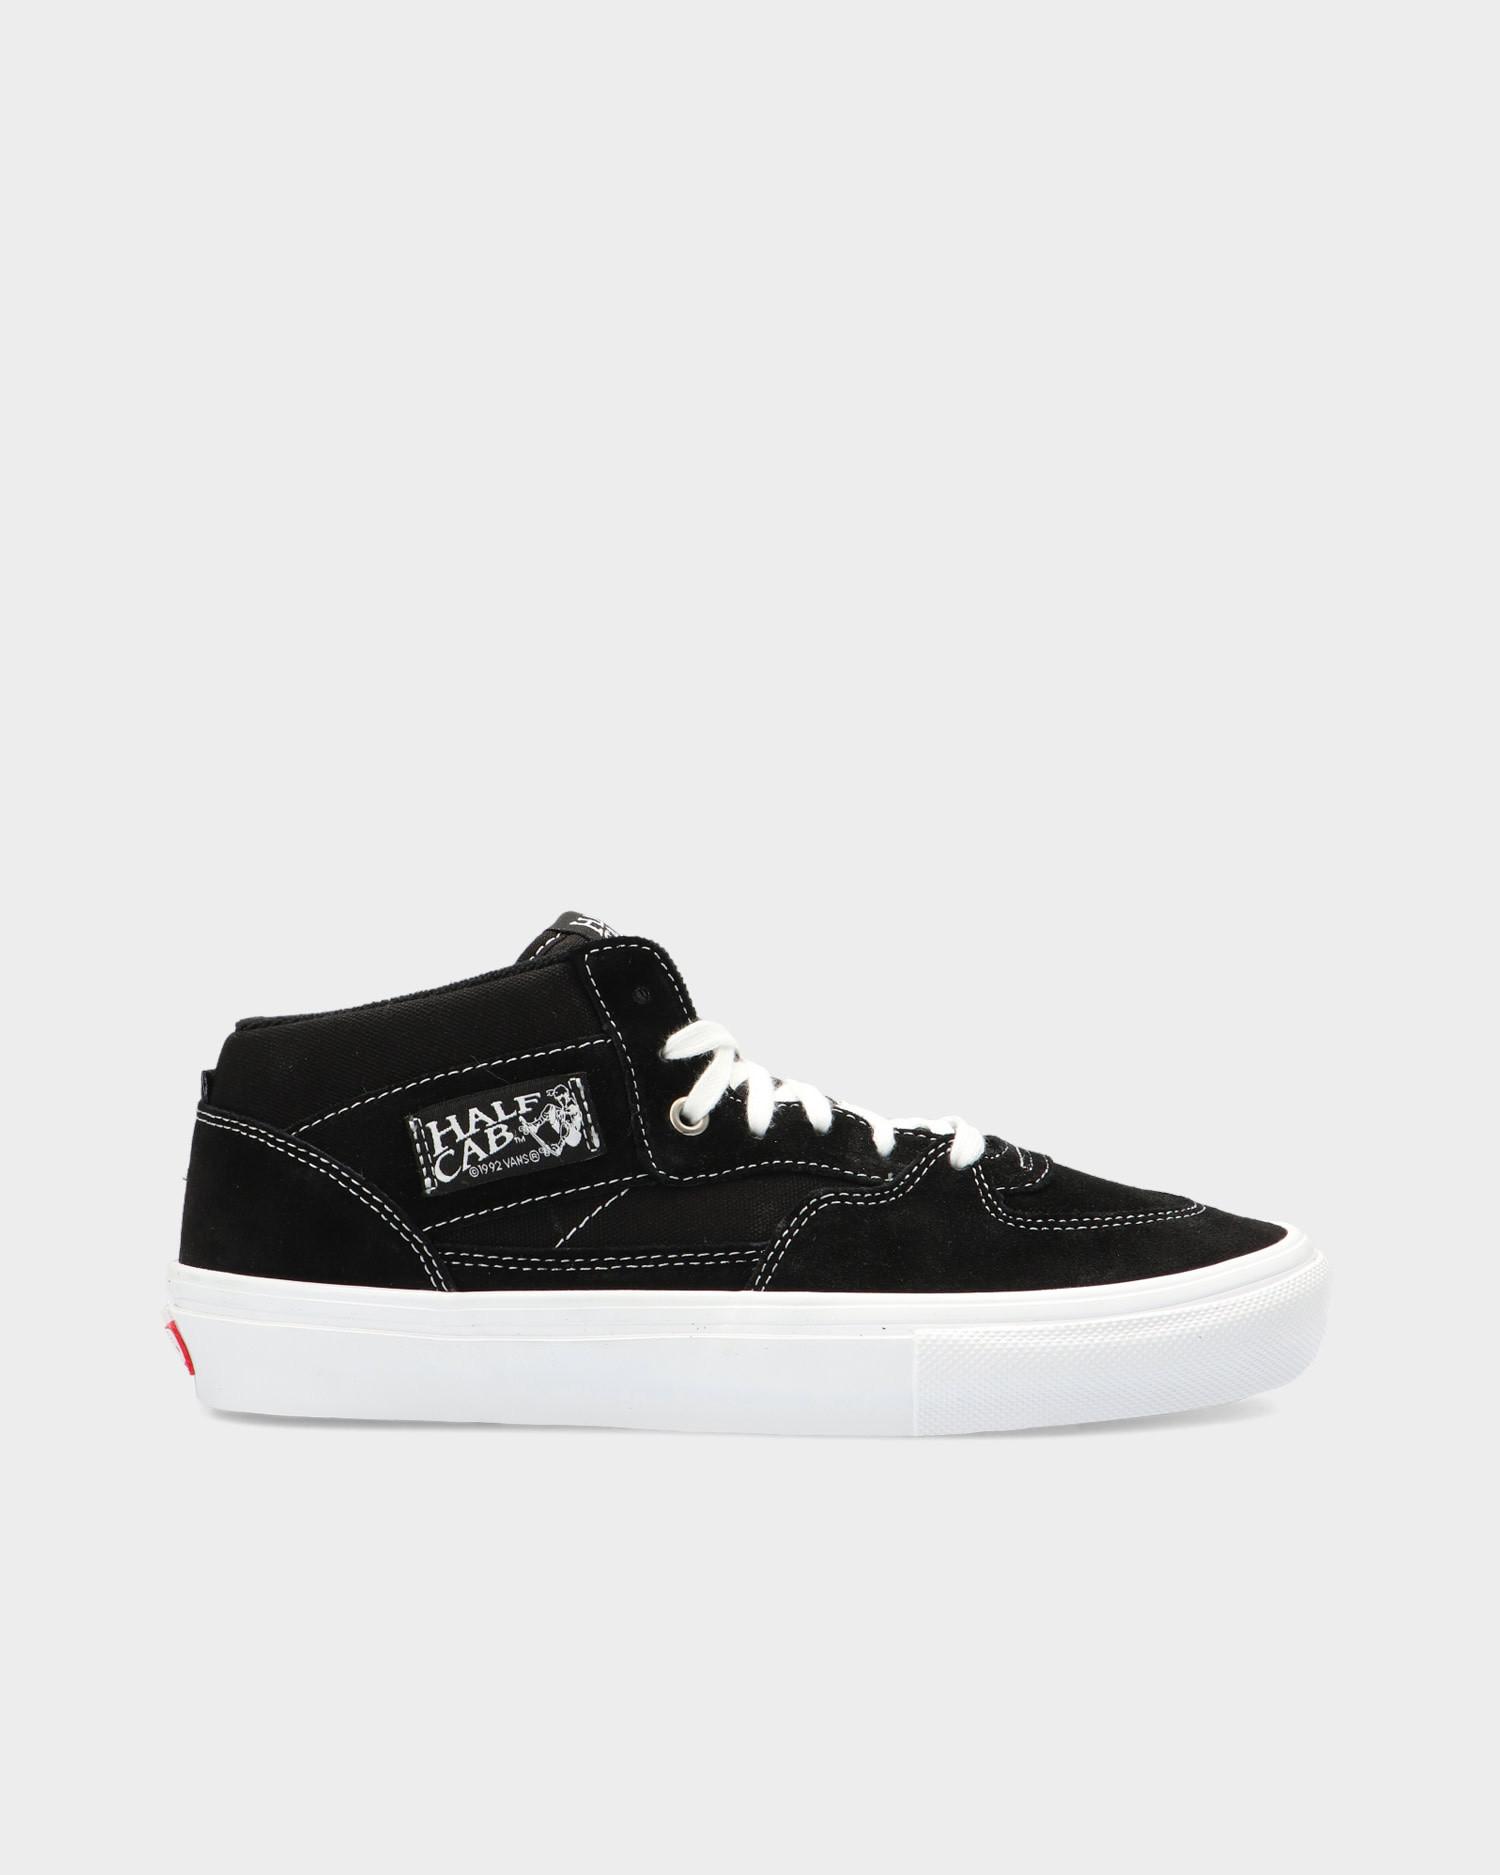 Vans Skate Half Cab Black/White